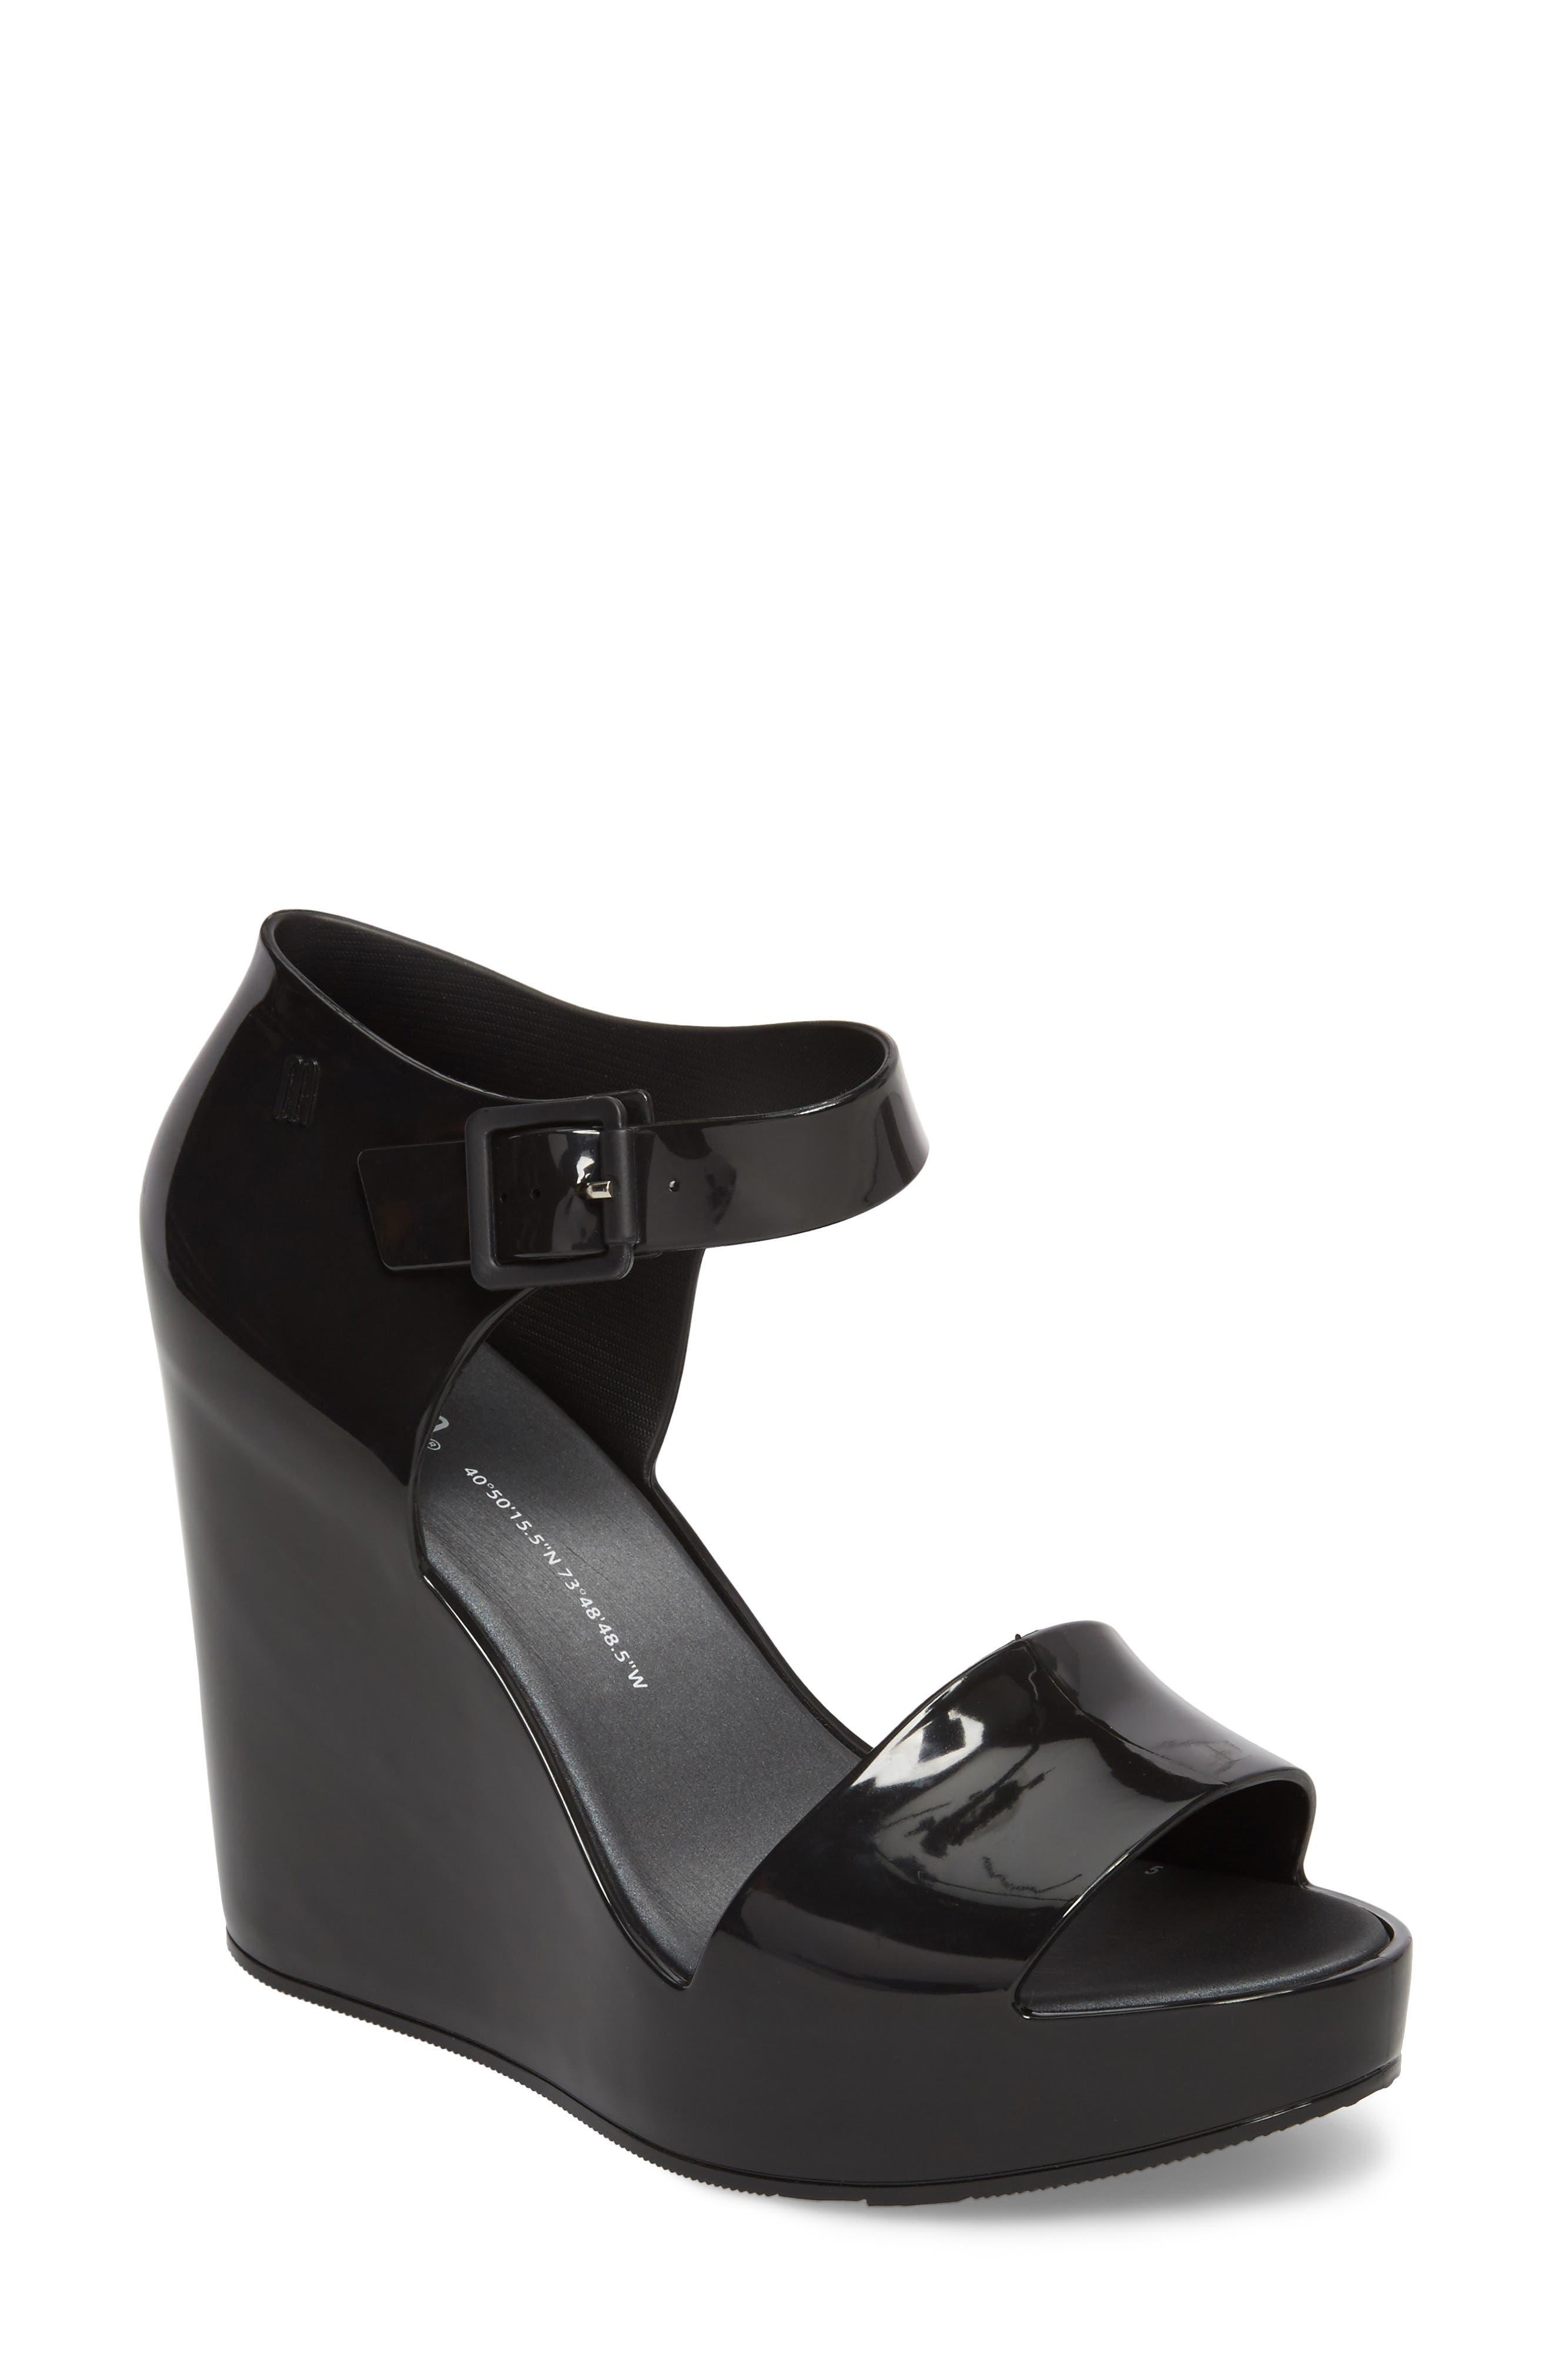 Mar Platform Wedge Sandal in Black